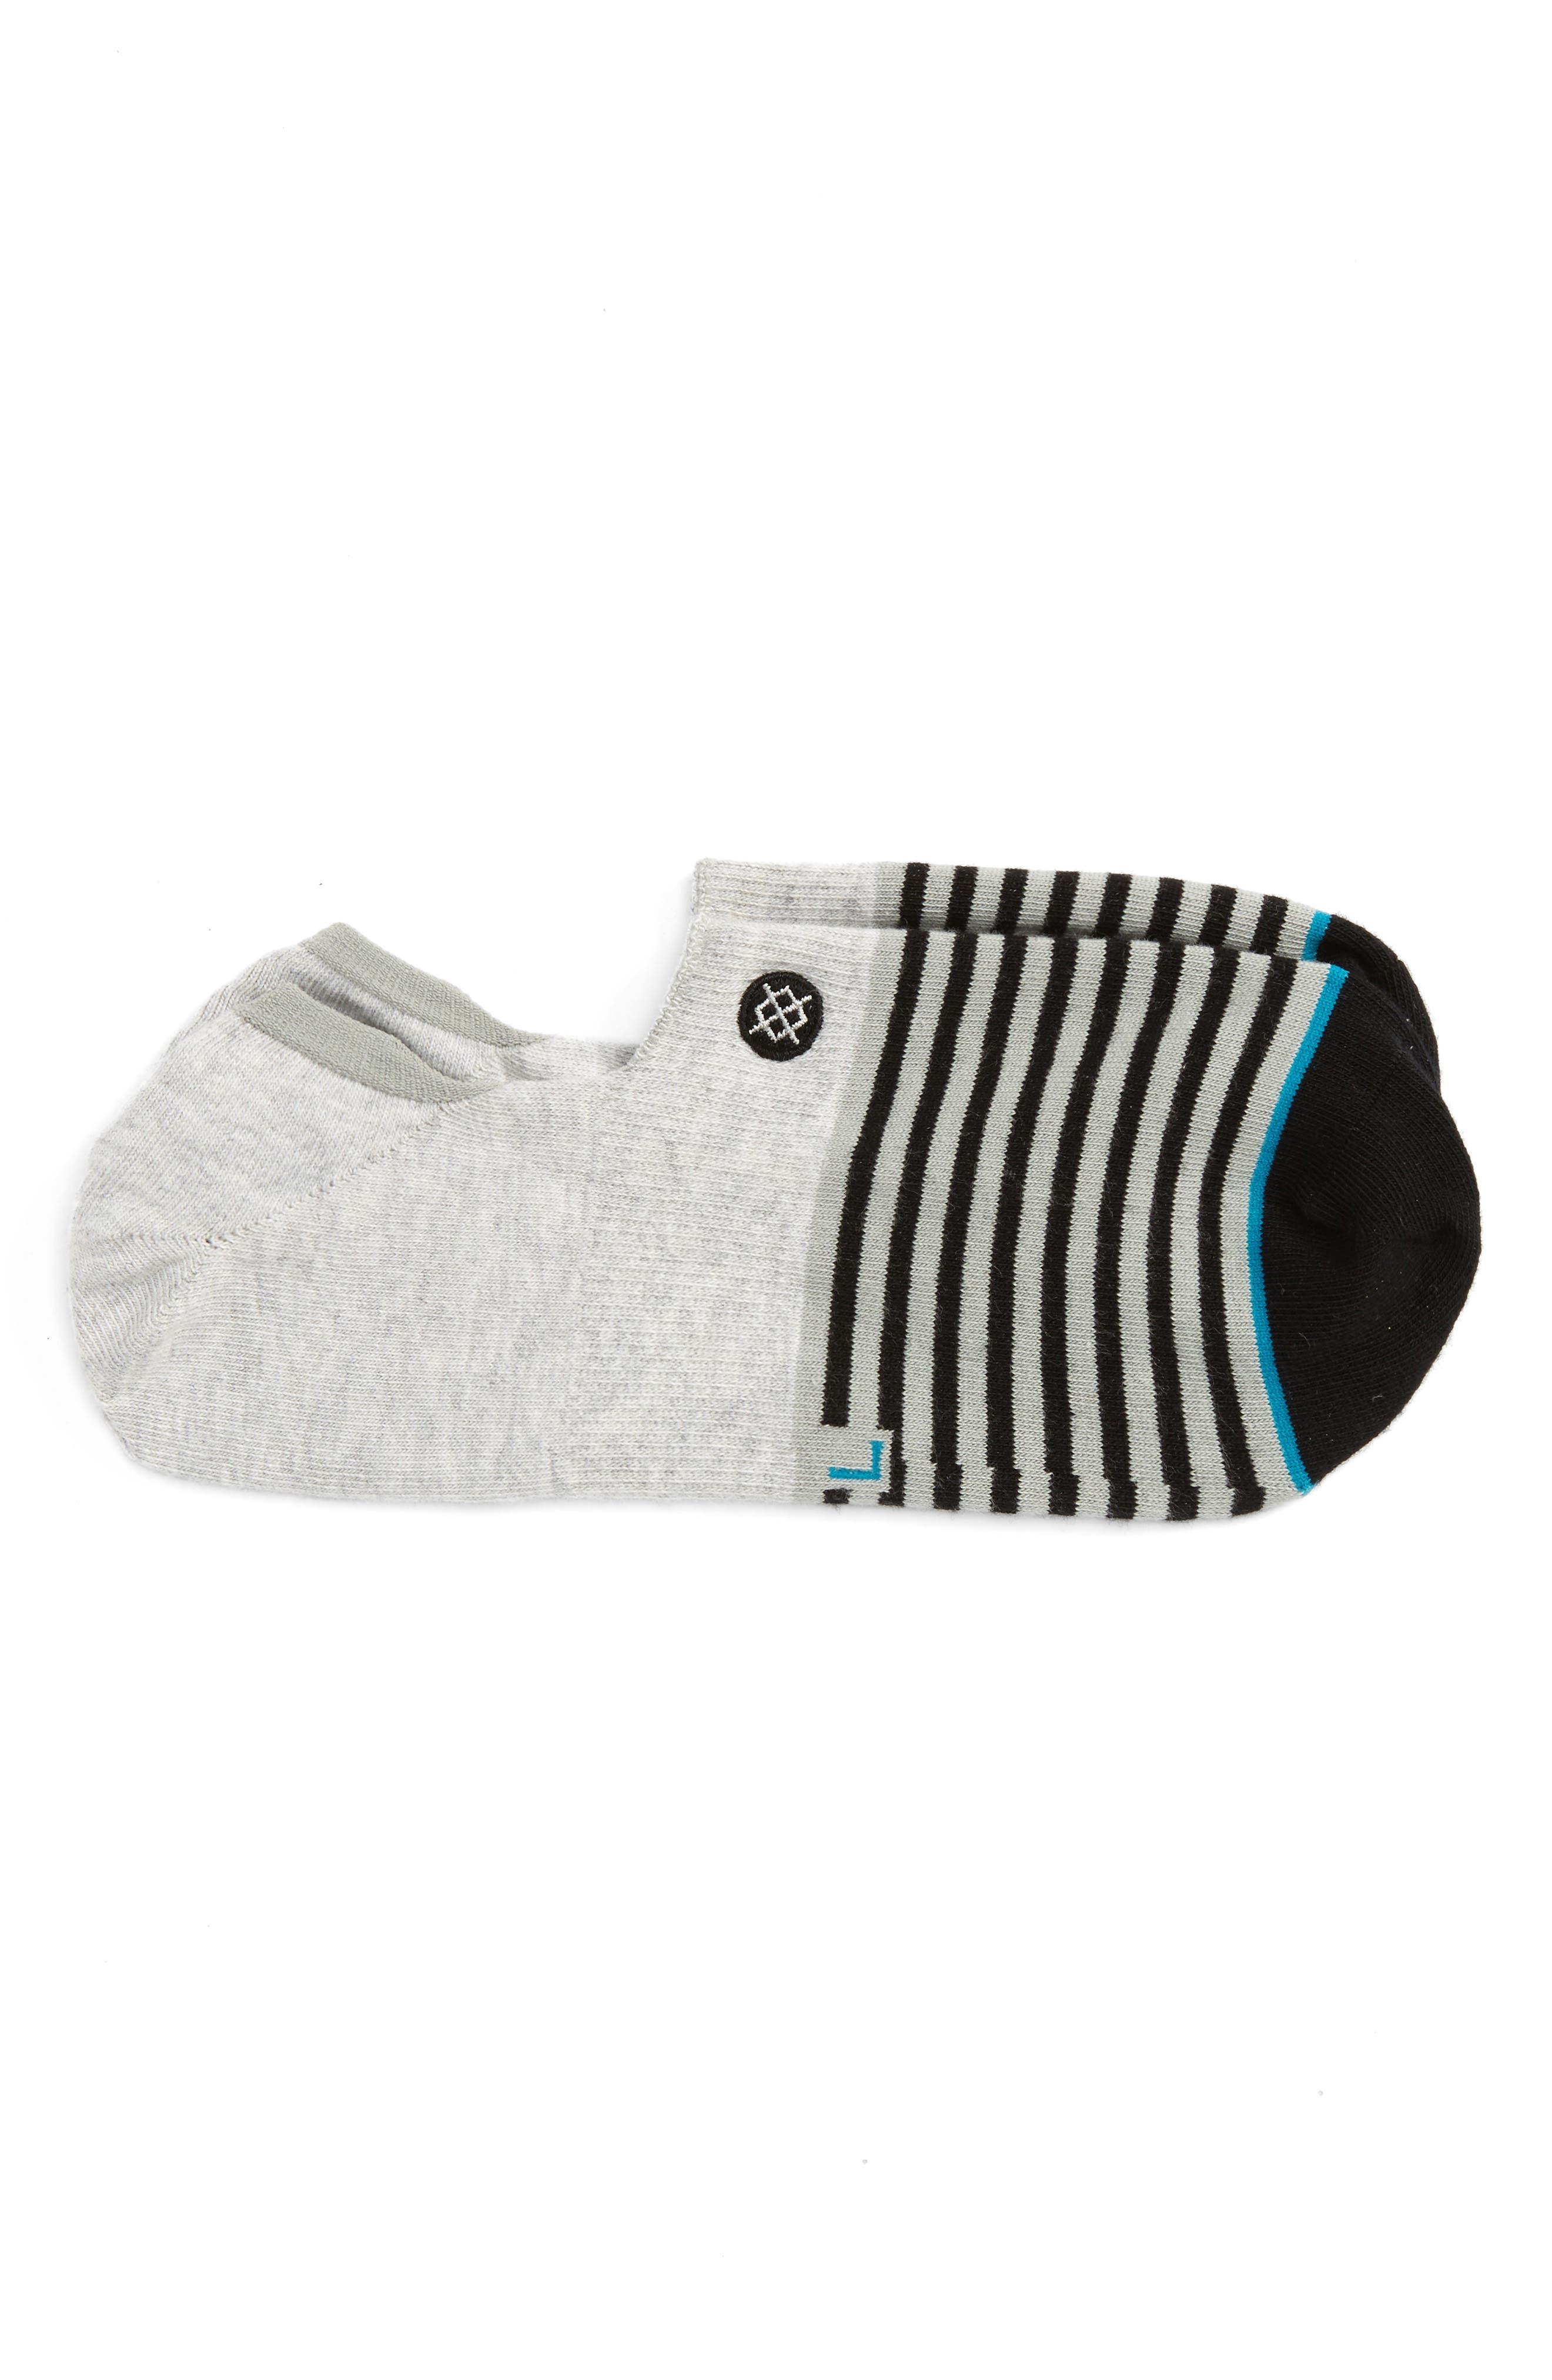 Main Image - Stance Nagano Striped No-Show Socks